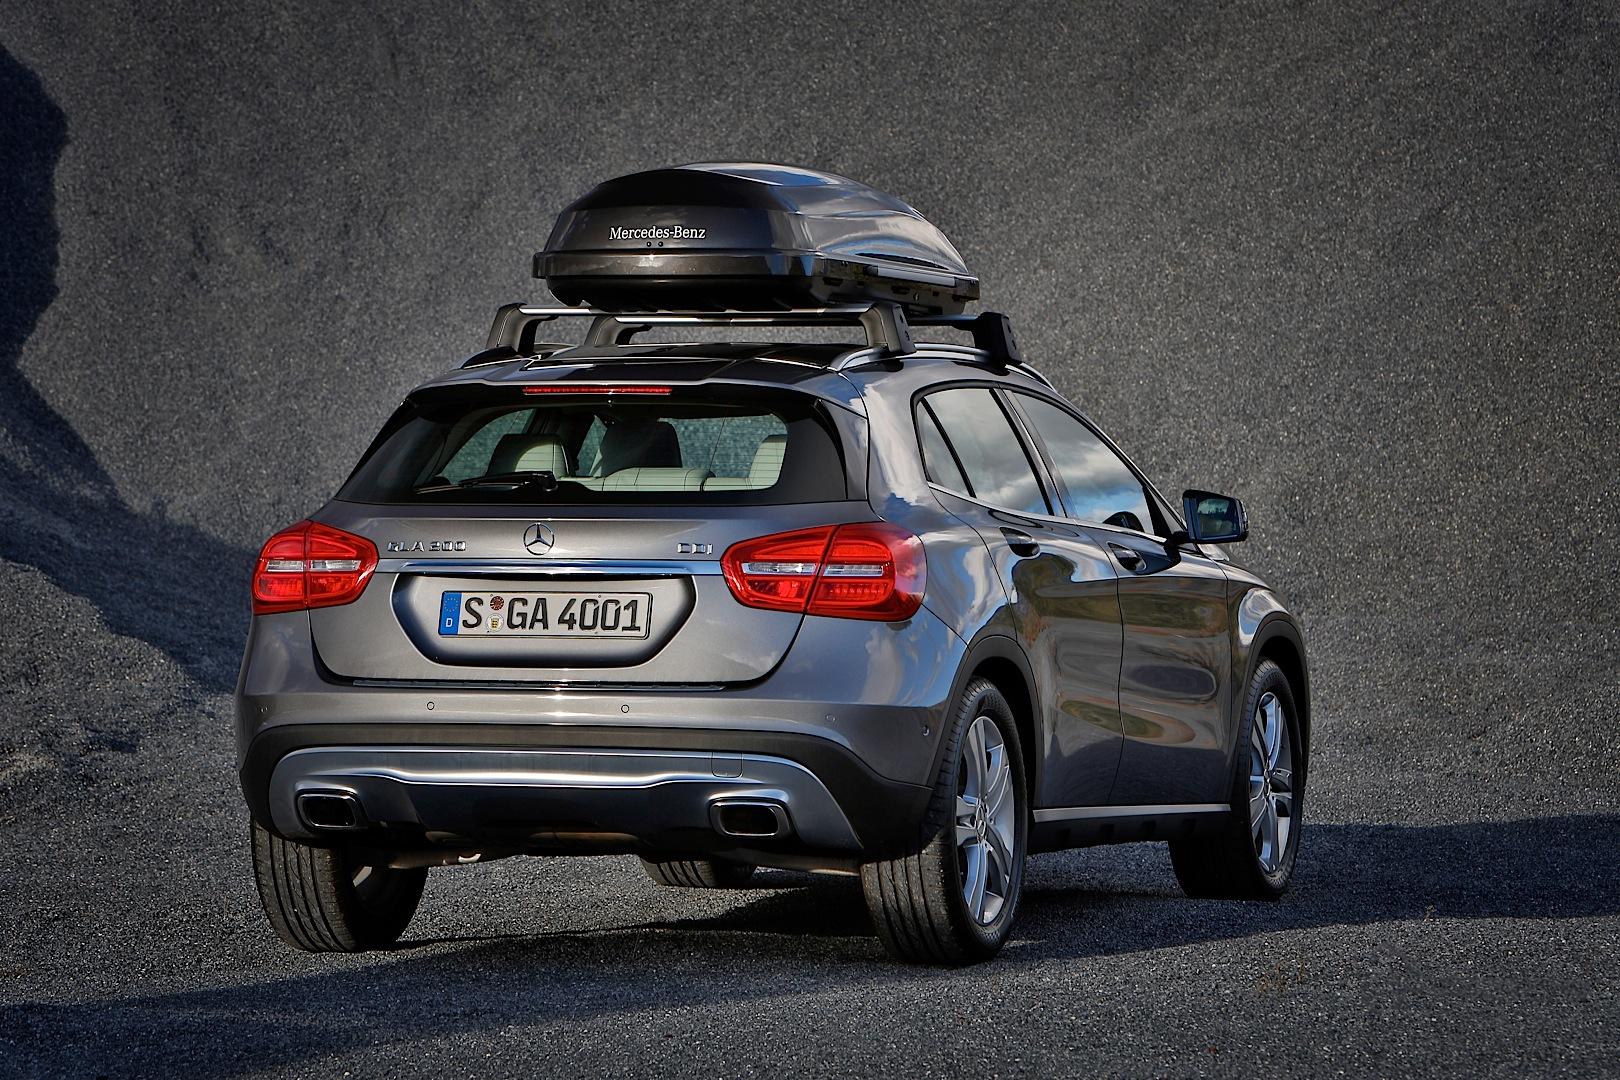 Mercedes benz gla gets new accessories autoevolution for Mercedes benz usa accessories